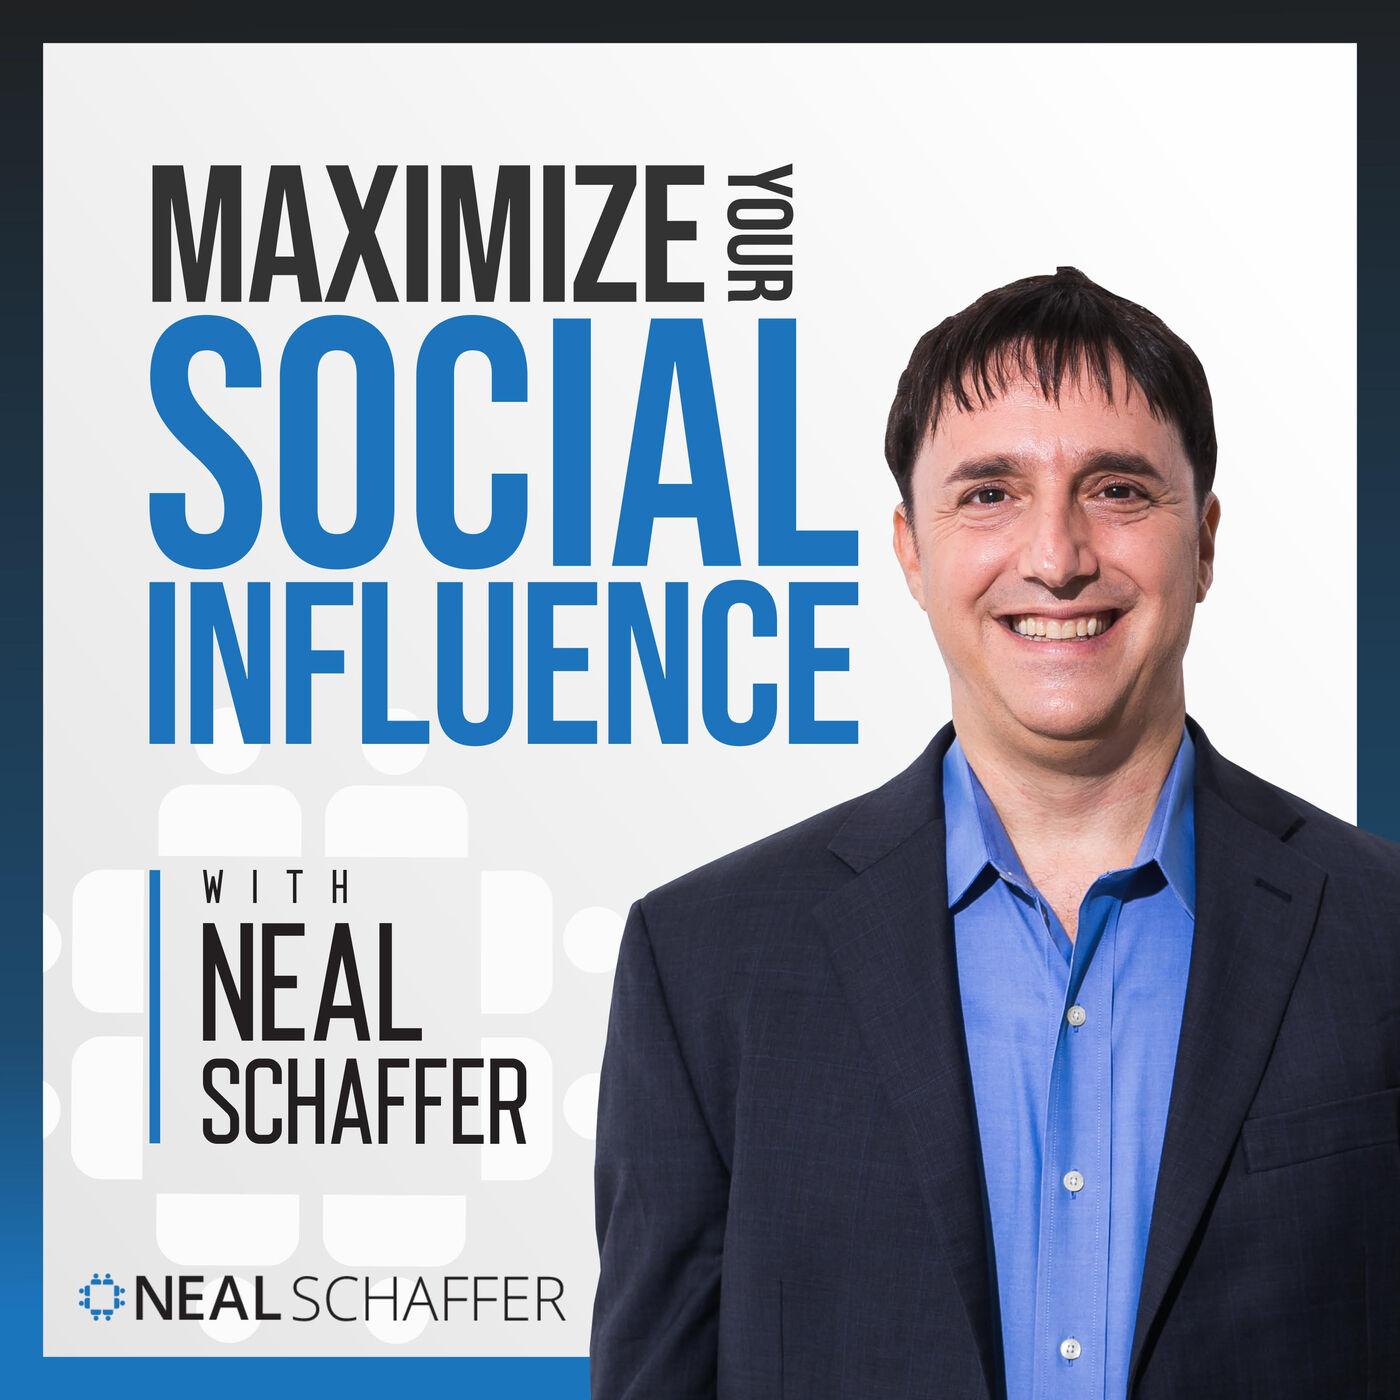 143: Fanocracy: The Next Evolution in Marketing? [David Meerman Scott Interview]